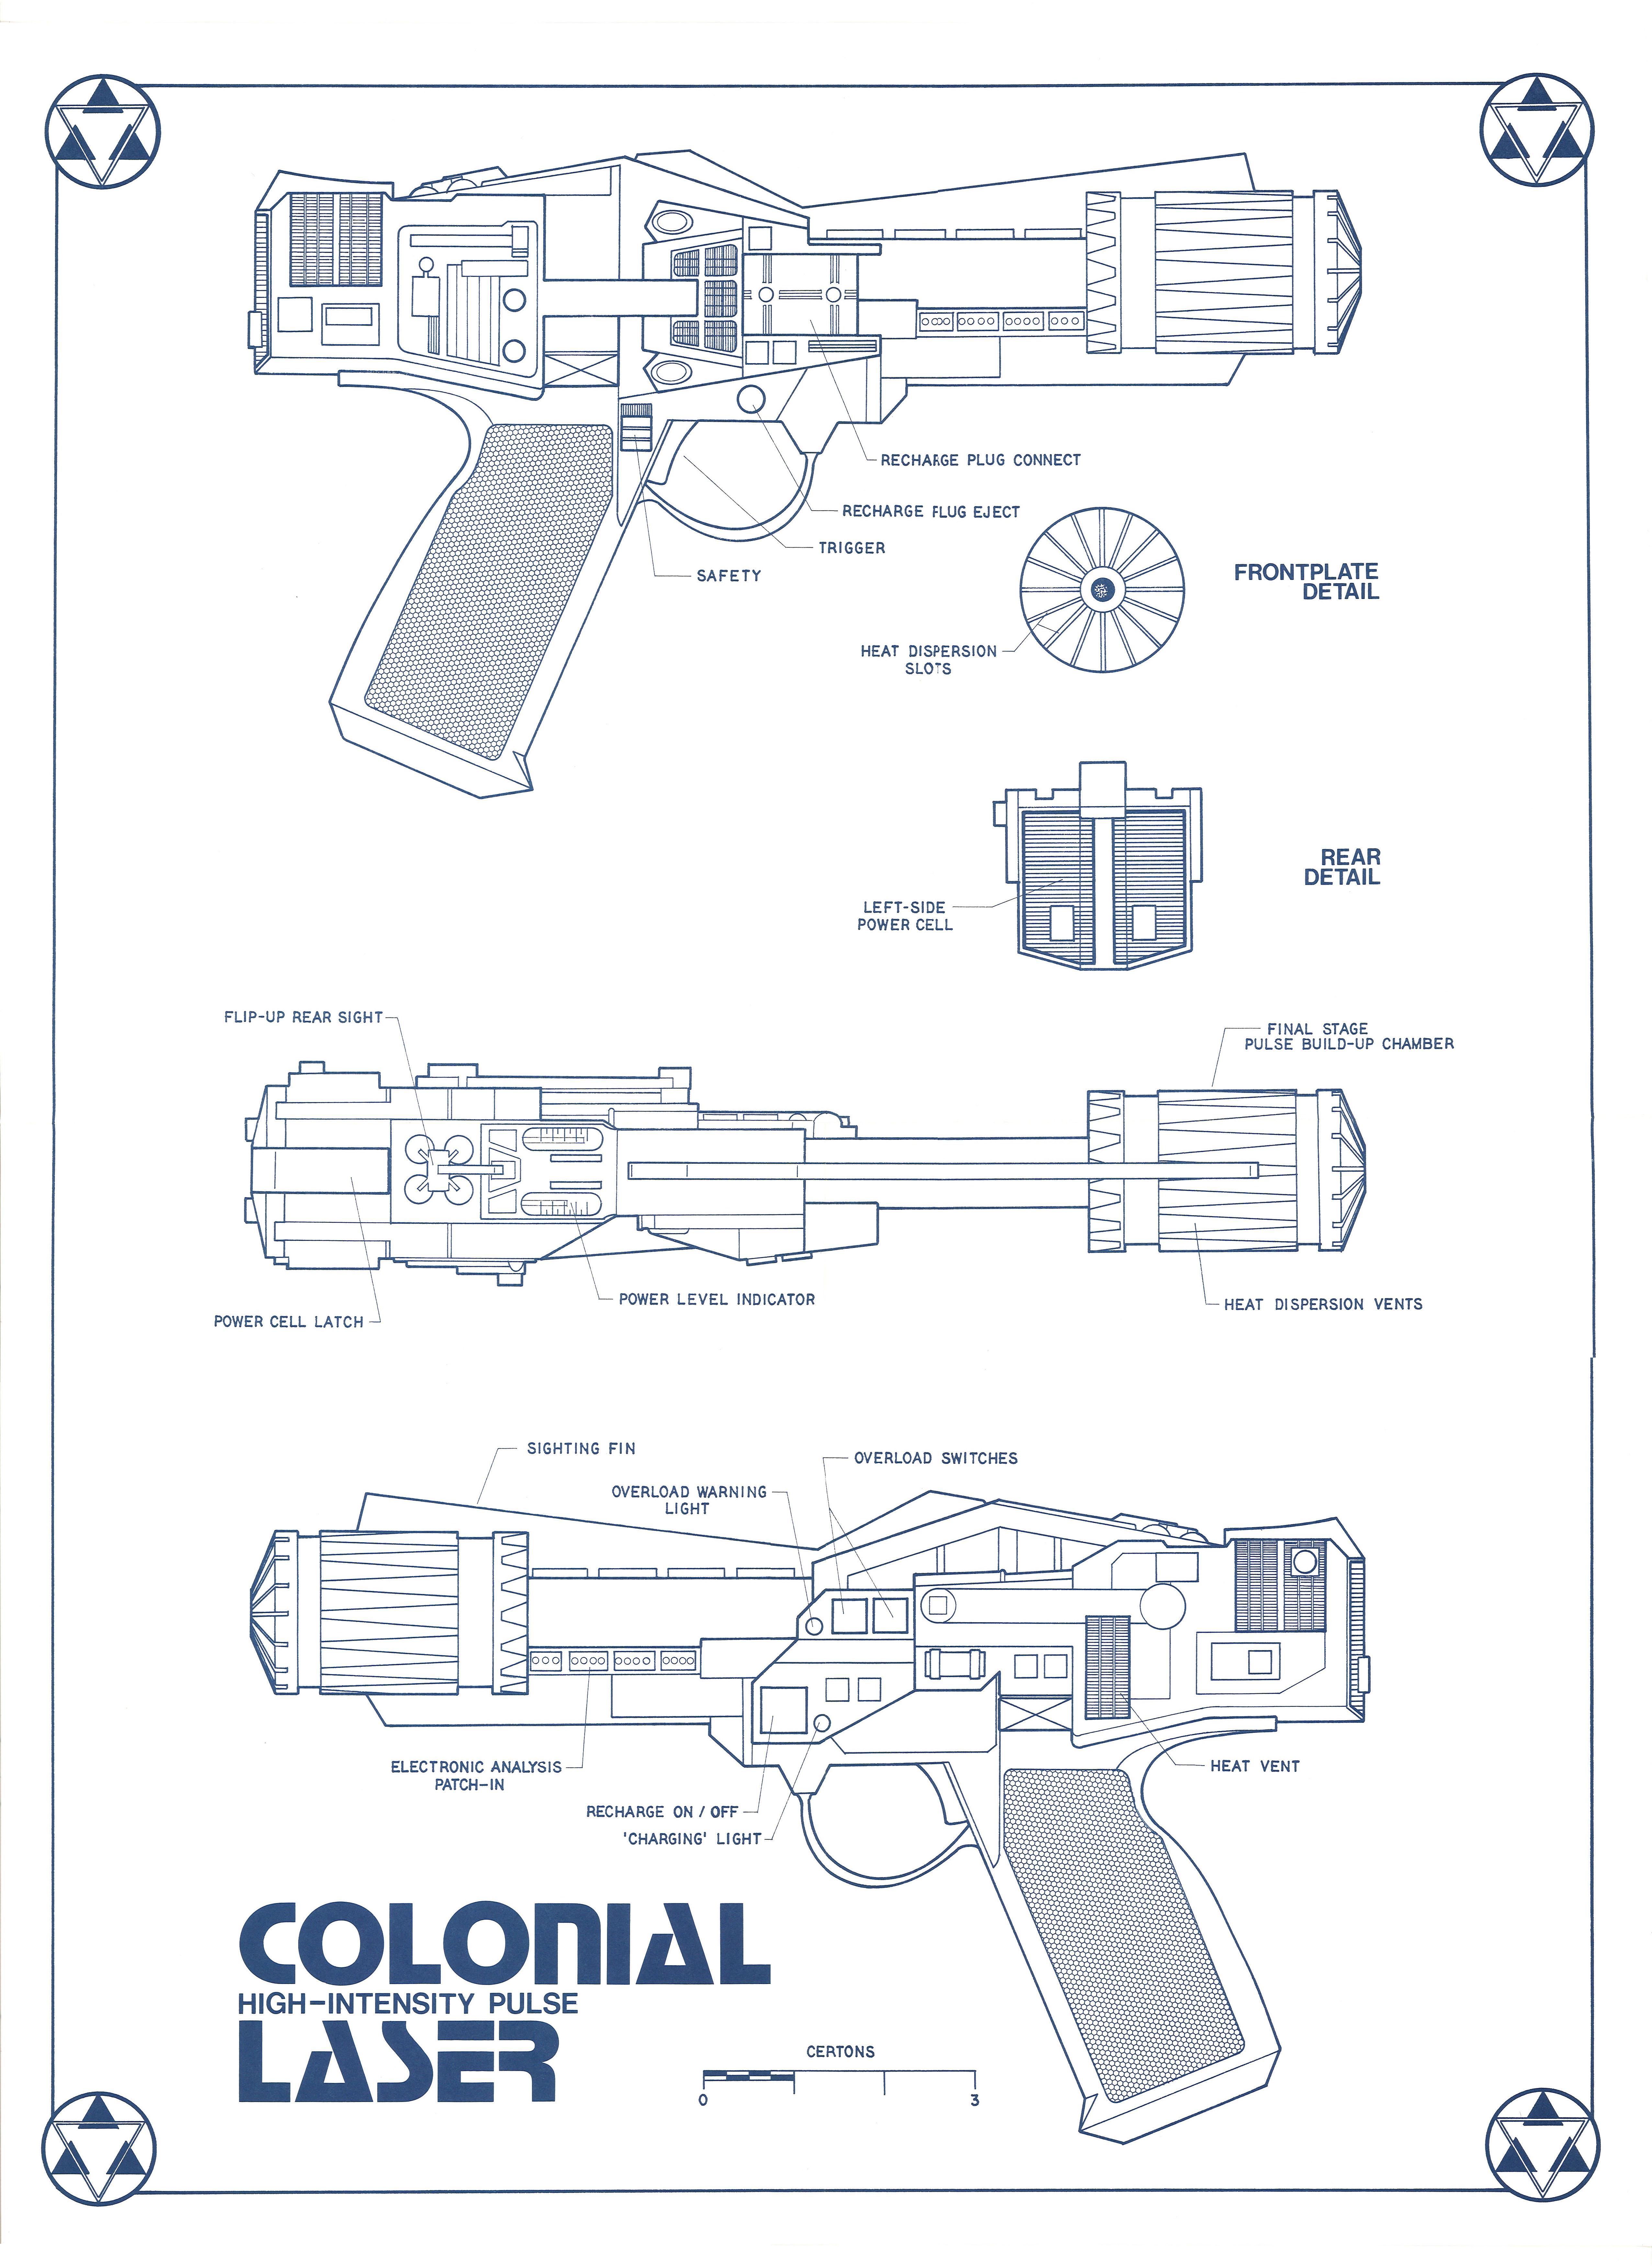 Star Trek Blueprints: Weapons and Field Equipt - 2